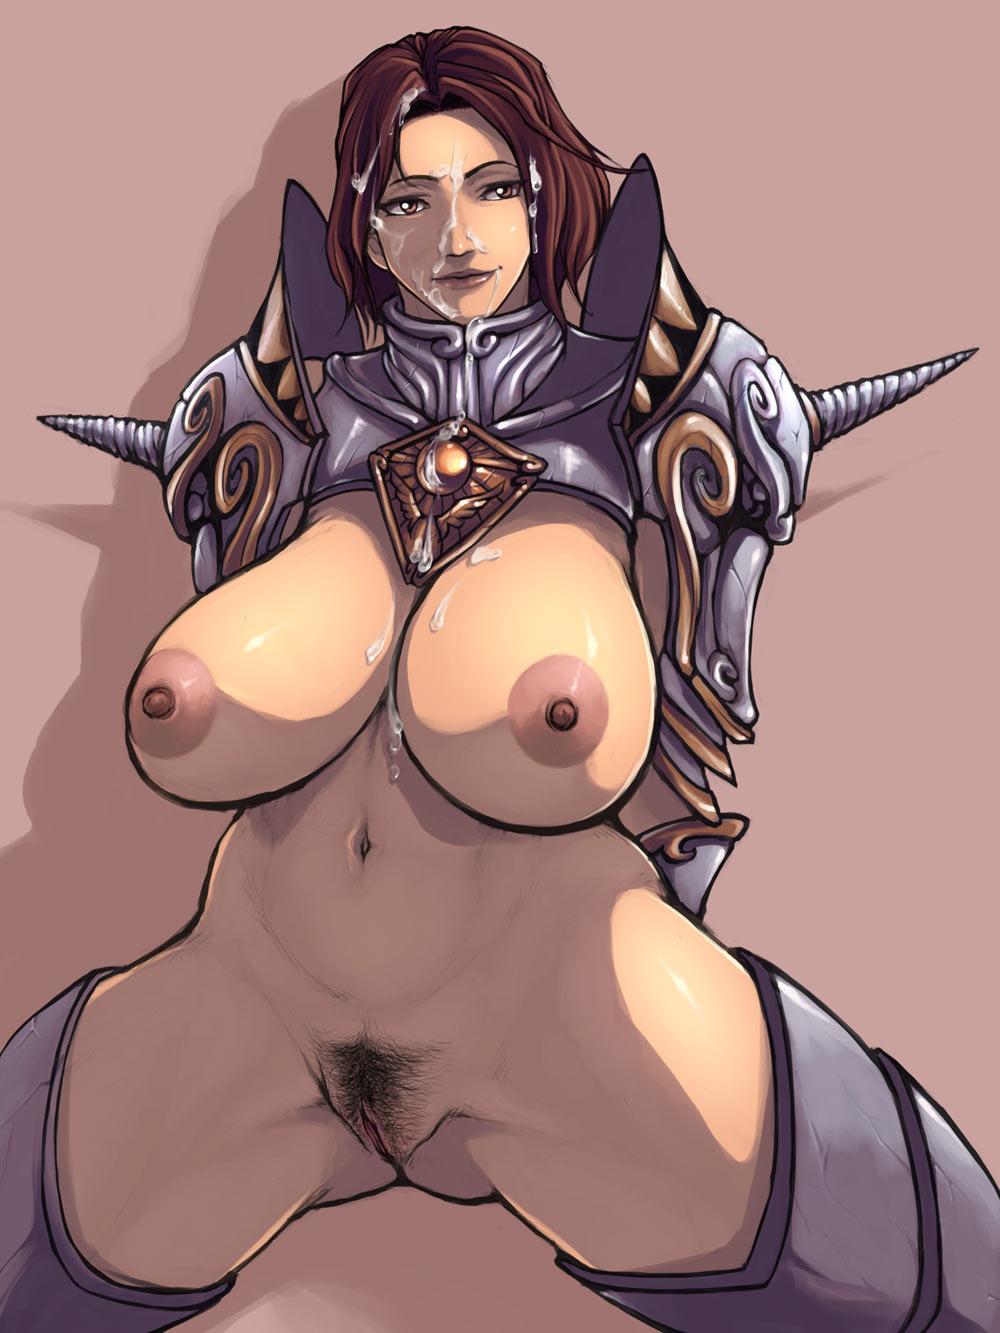 messiah might dark nudity magic of and Fate stay night purple hair girl